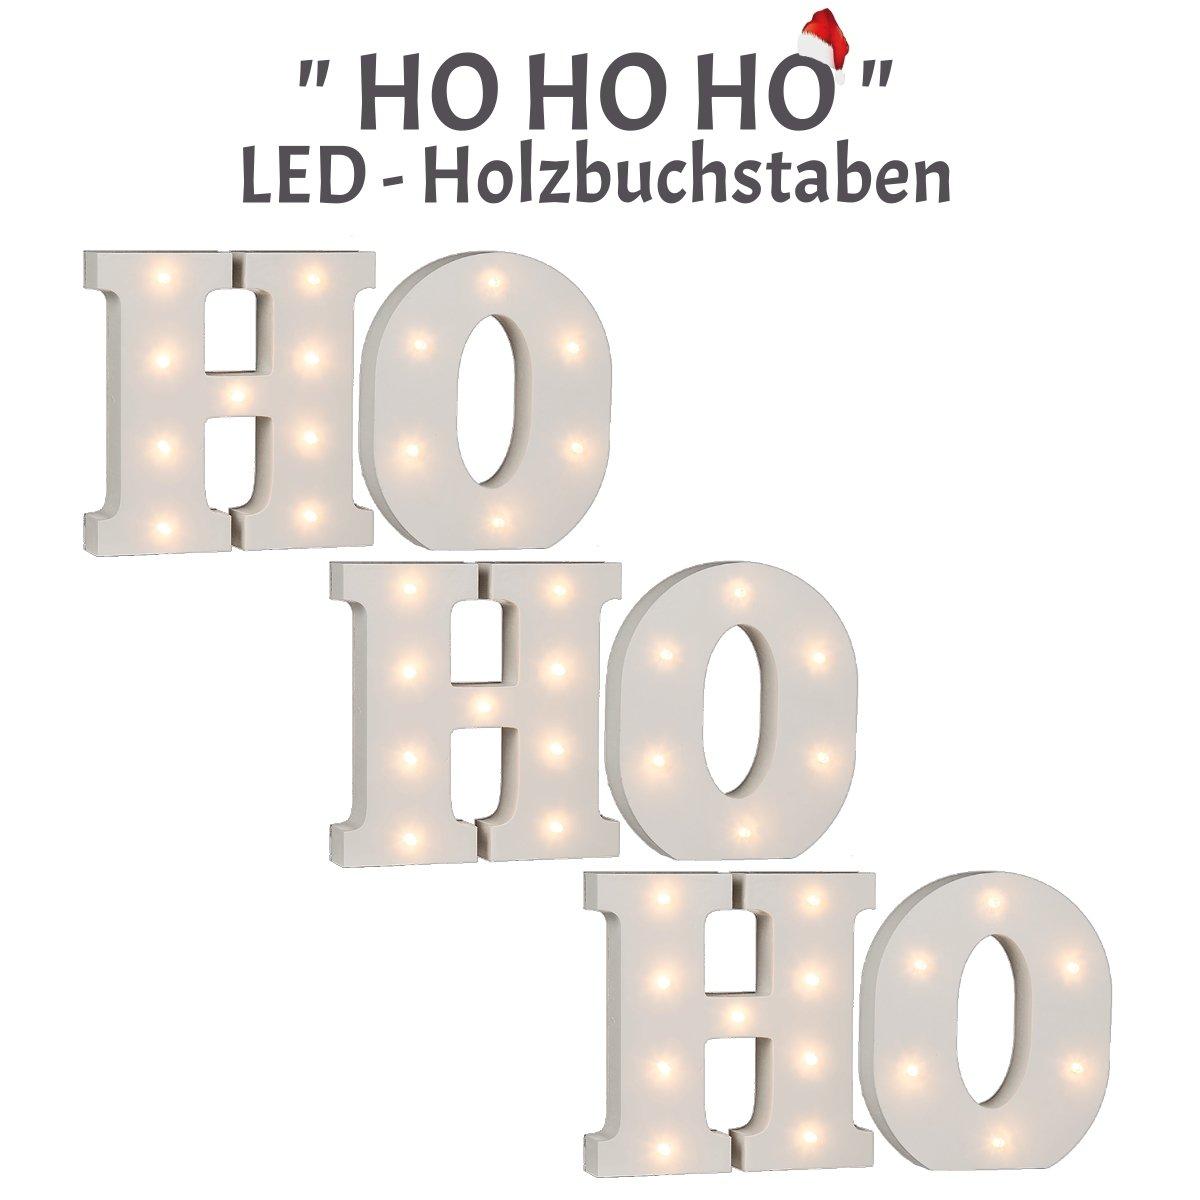 schenken-24 Beleuchteter Schriftzug / \'Ho Ho Ho\' / 6-teilig/LED ...